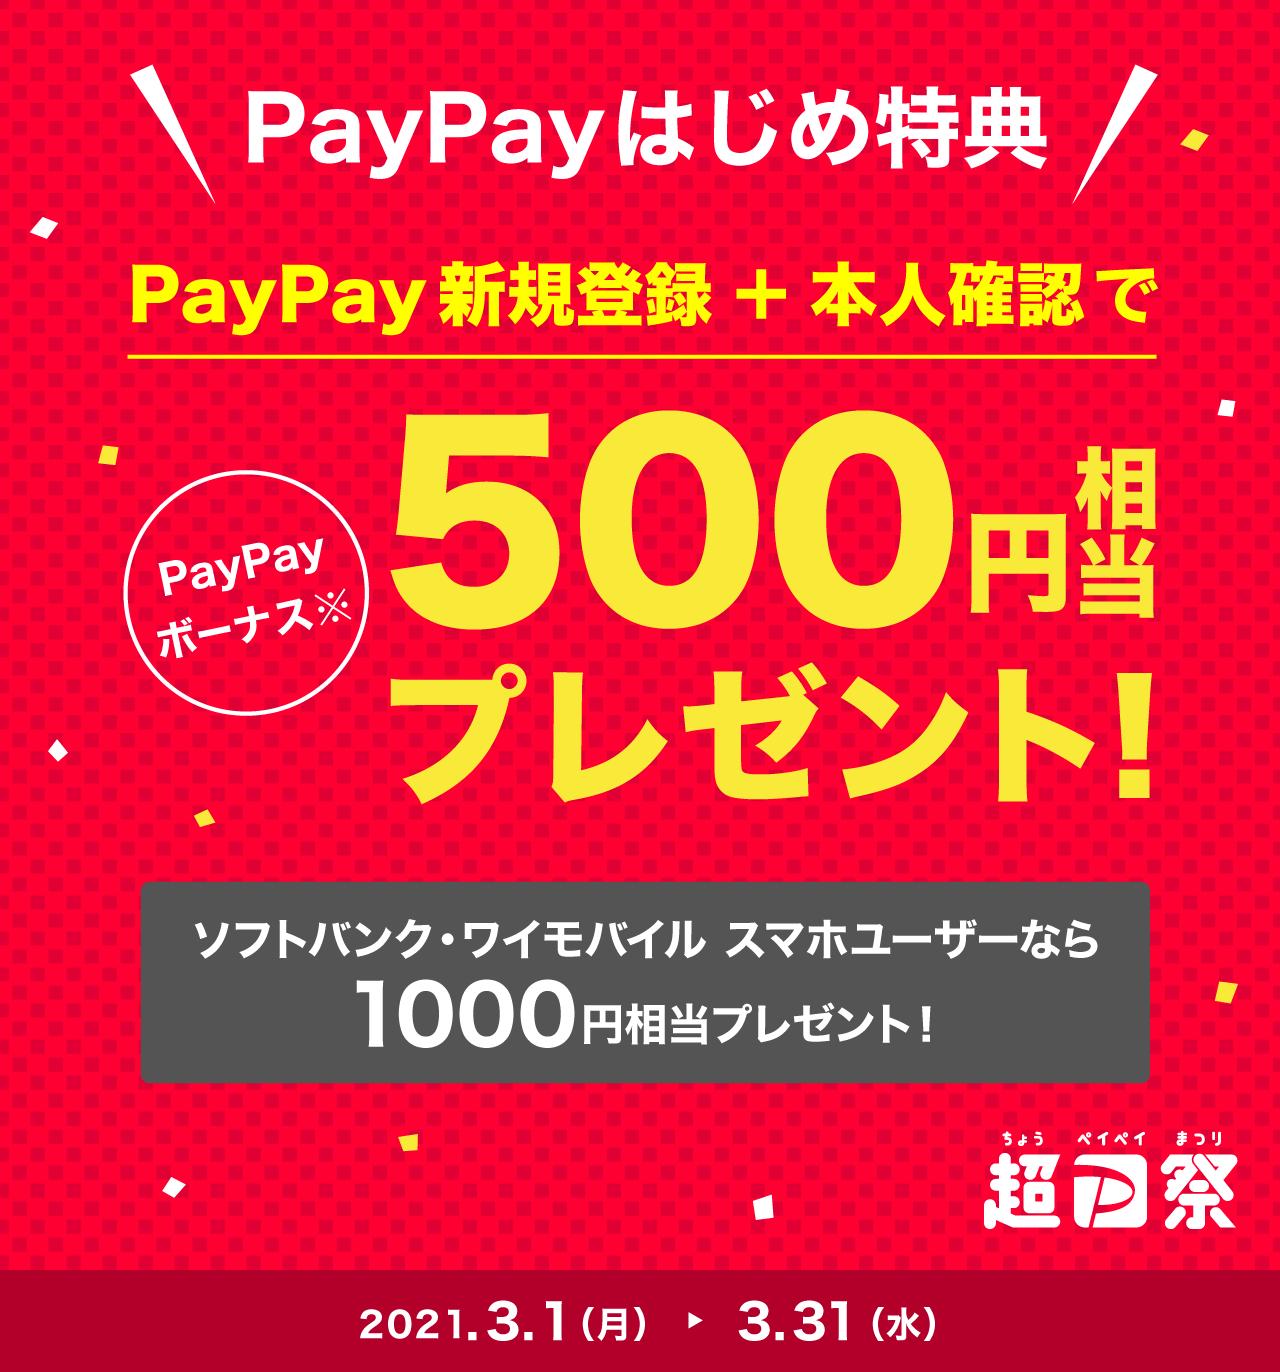 PayPayの新規登録+本人確認で500円相当が貰える。ソフトバンク・ワイモバイルユーザーならば1000円相当が貰える。3/1~3/31。